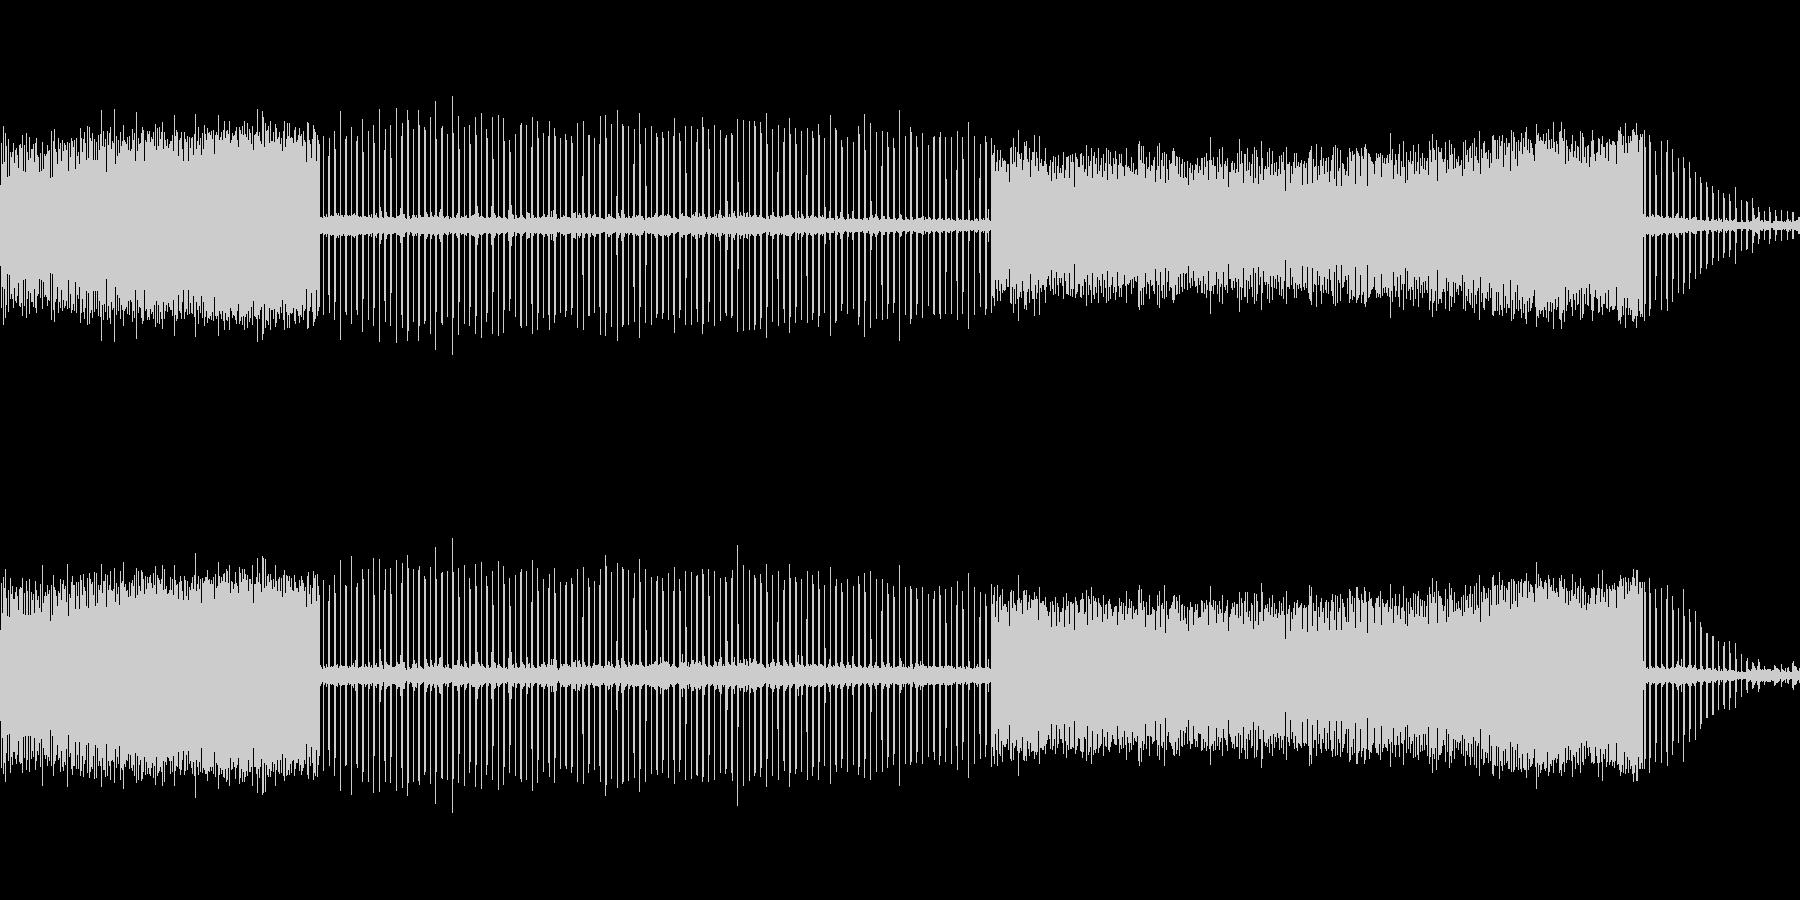 bの近くの水スプリンクラーティックの未再生の波形